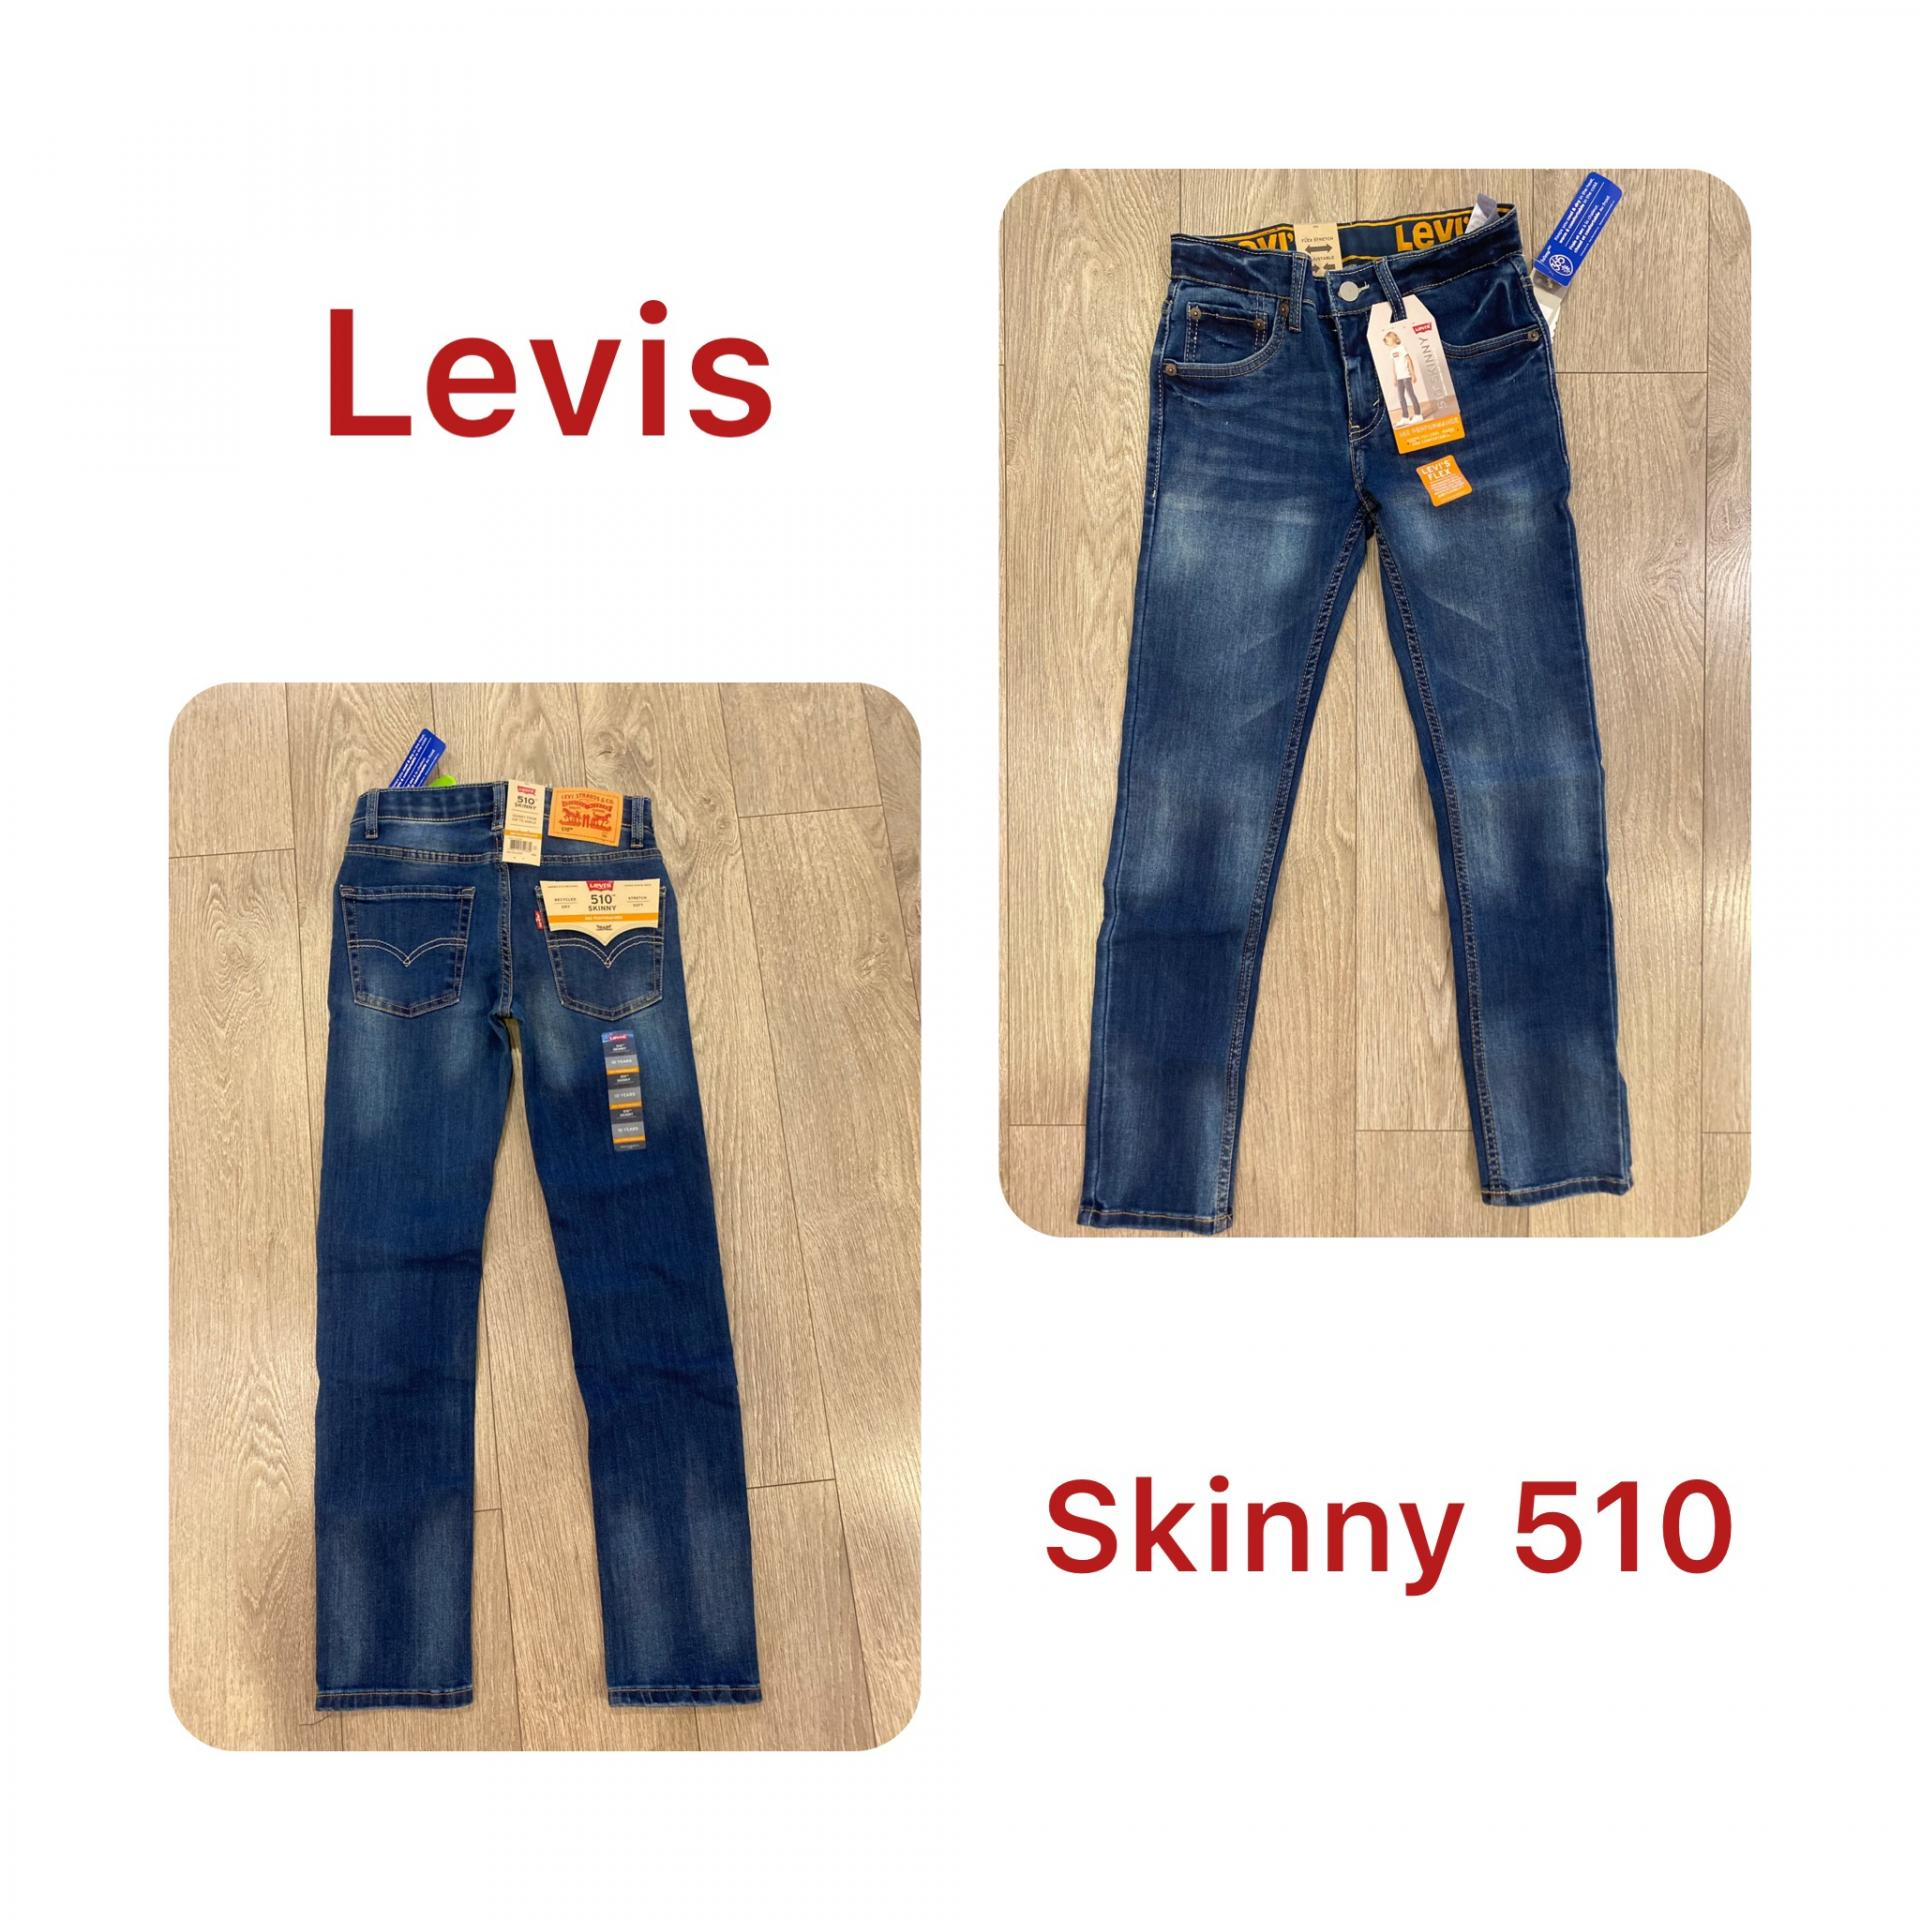 Vaquero Levis skinny 510 chico